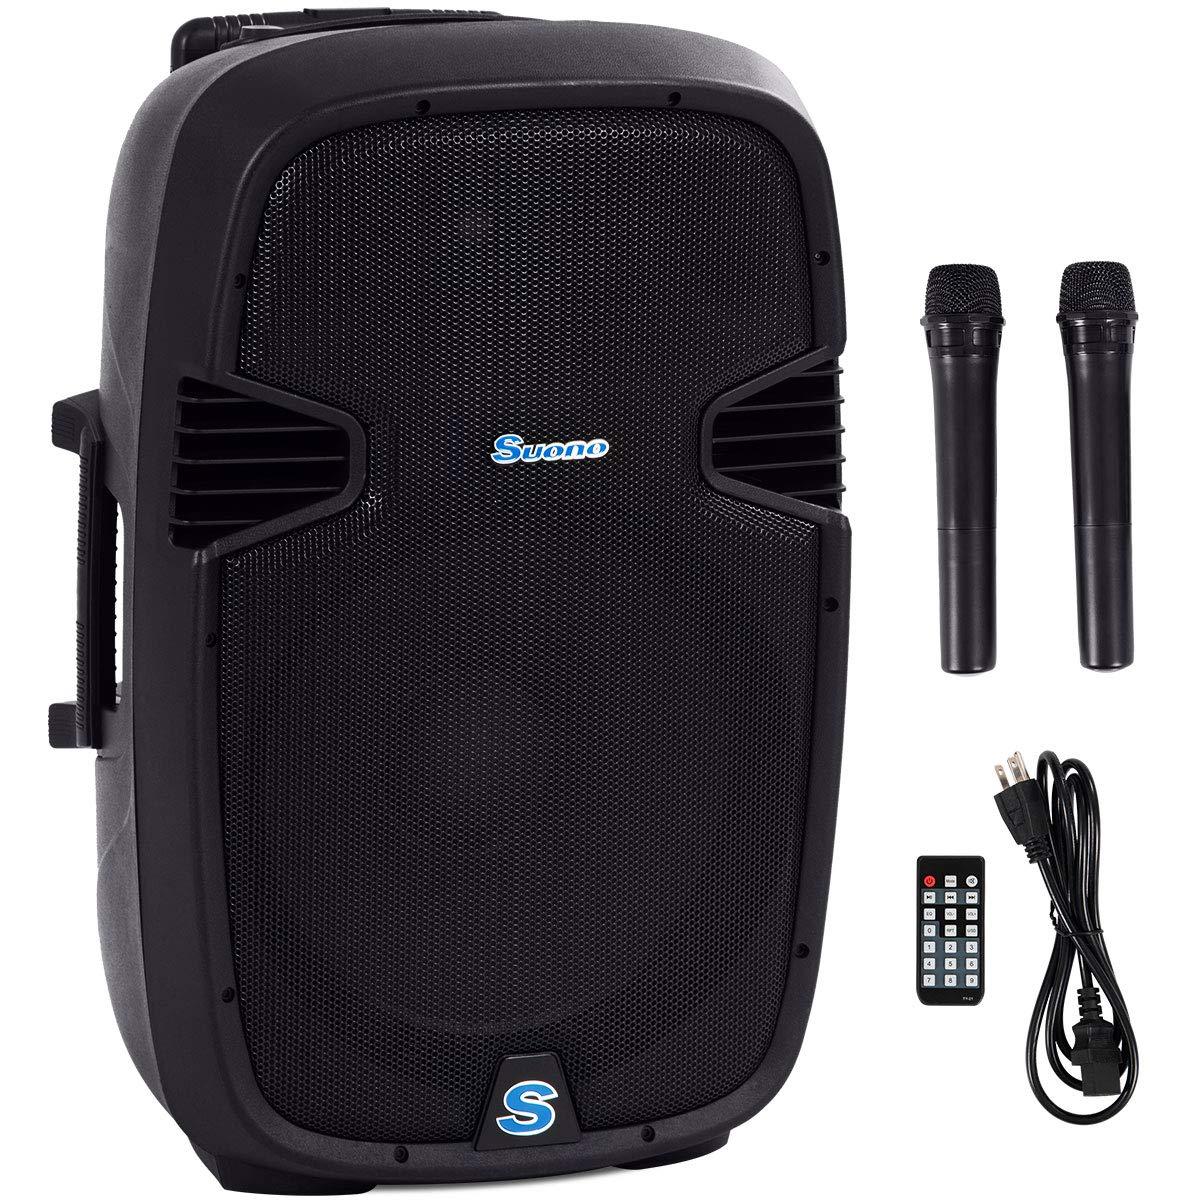 Suono Powered Speakers, 2-Way Full Range Portable DJ/PA Speaker System Set With Microphones/USB/Bluetooth (15'' 1000W)